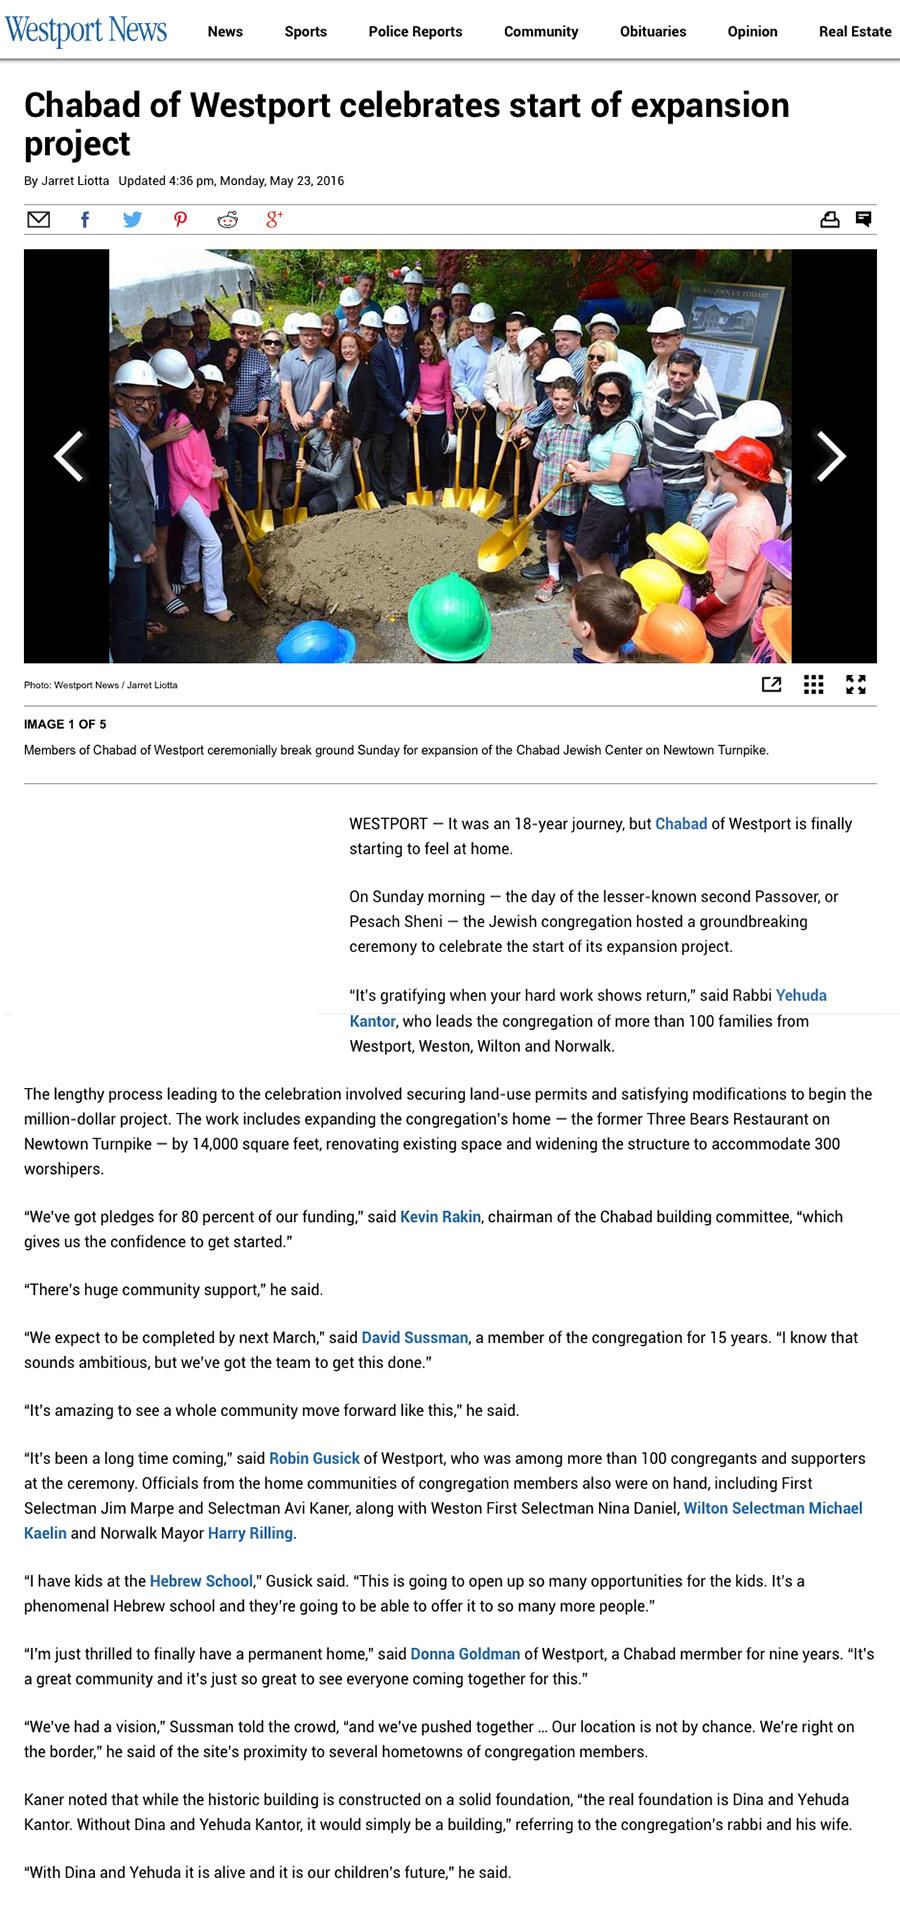 WestportNews_2016-05-25.jpg